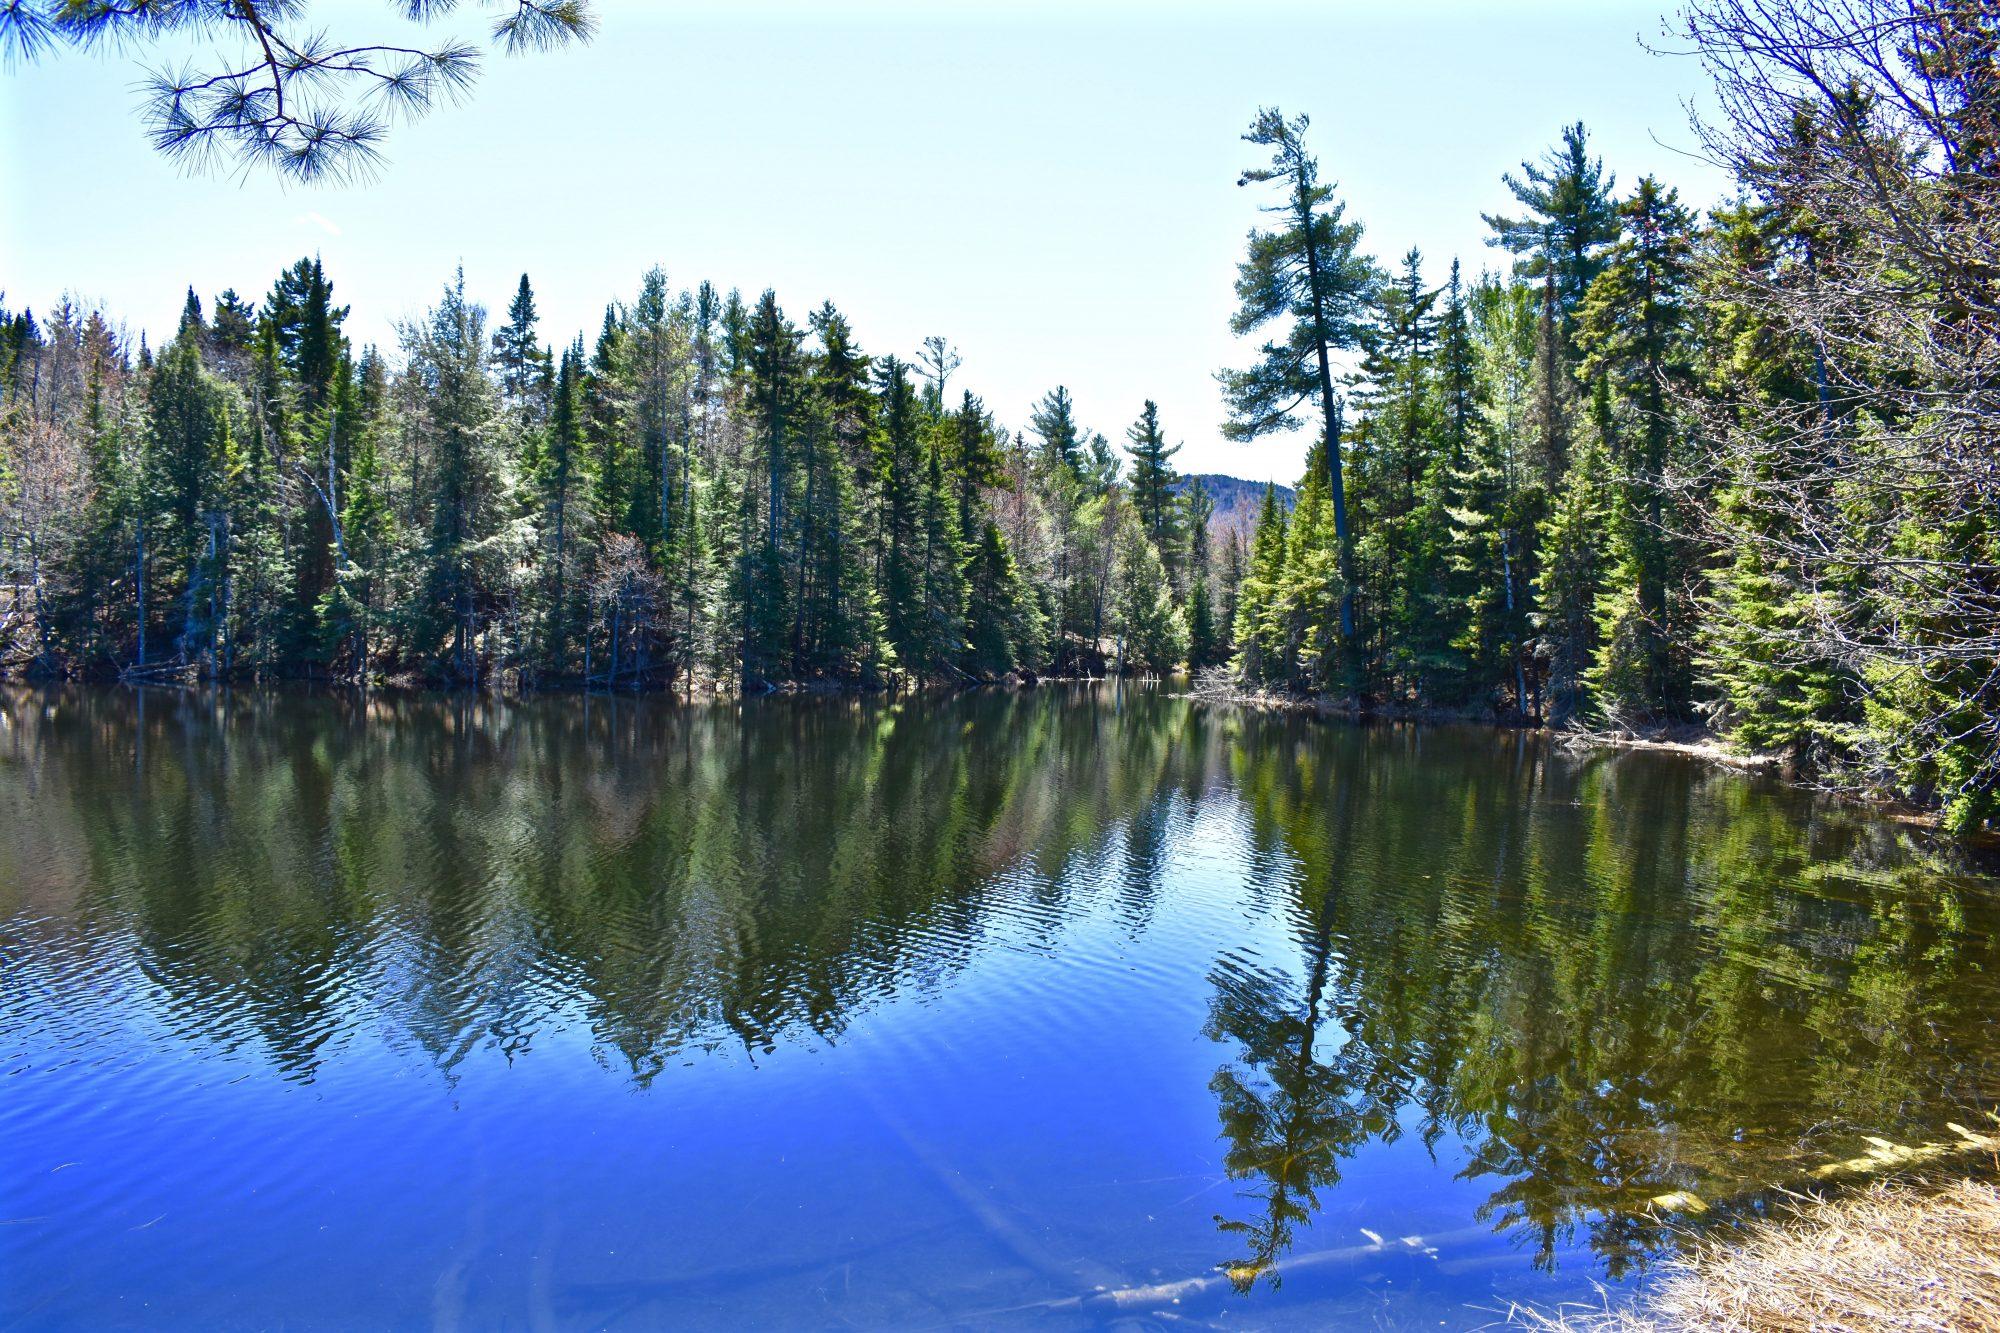 Pond- Pine good